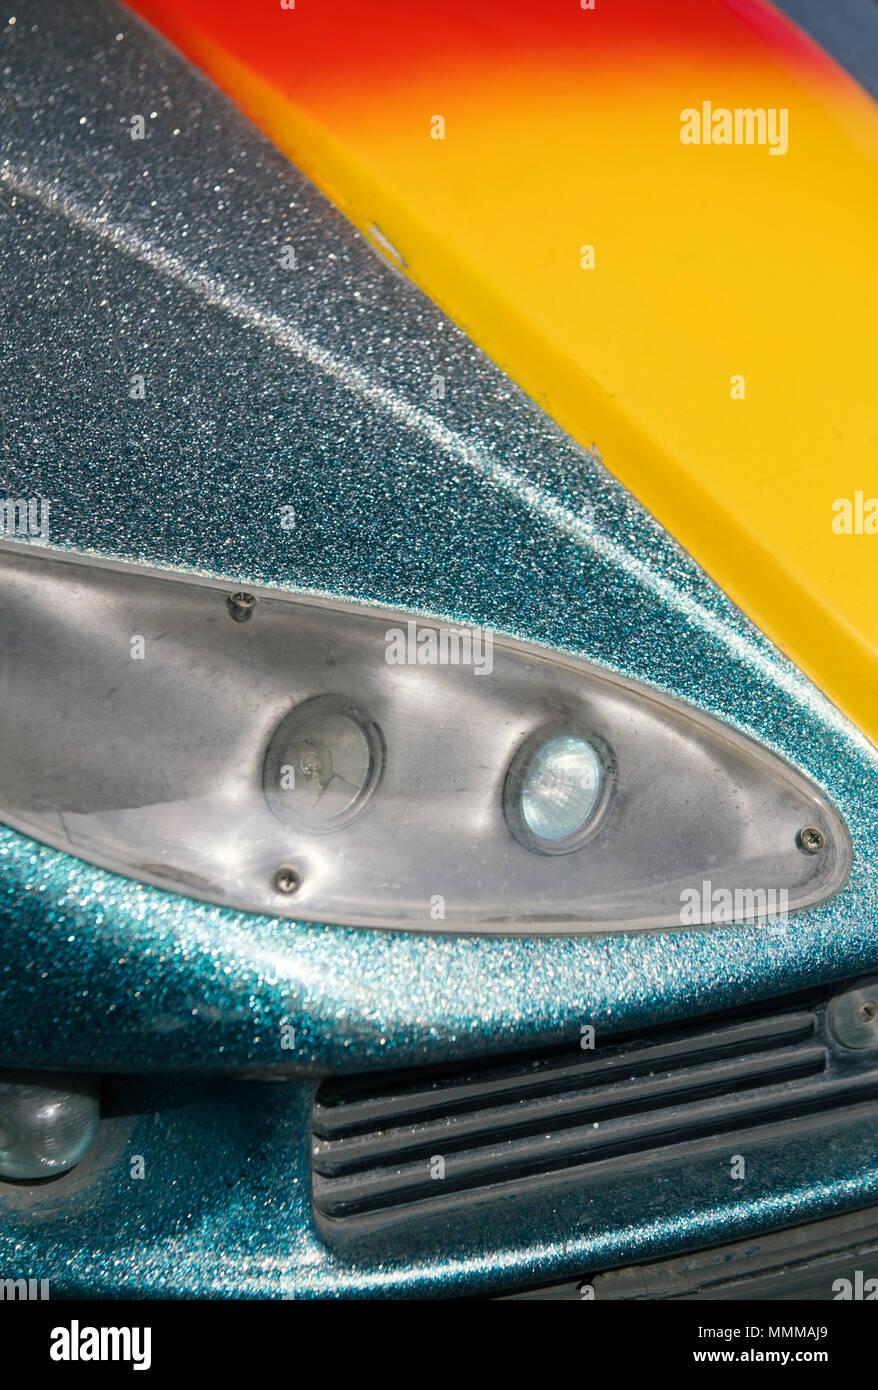 Detail of a bumper car, or dodgem, at a fairground - Stock Image